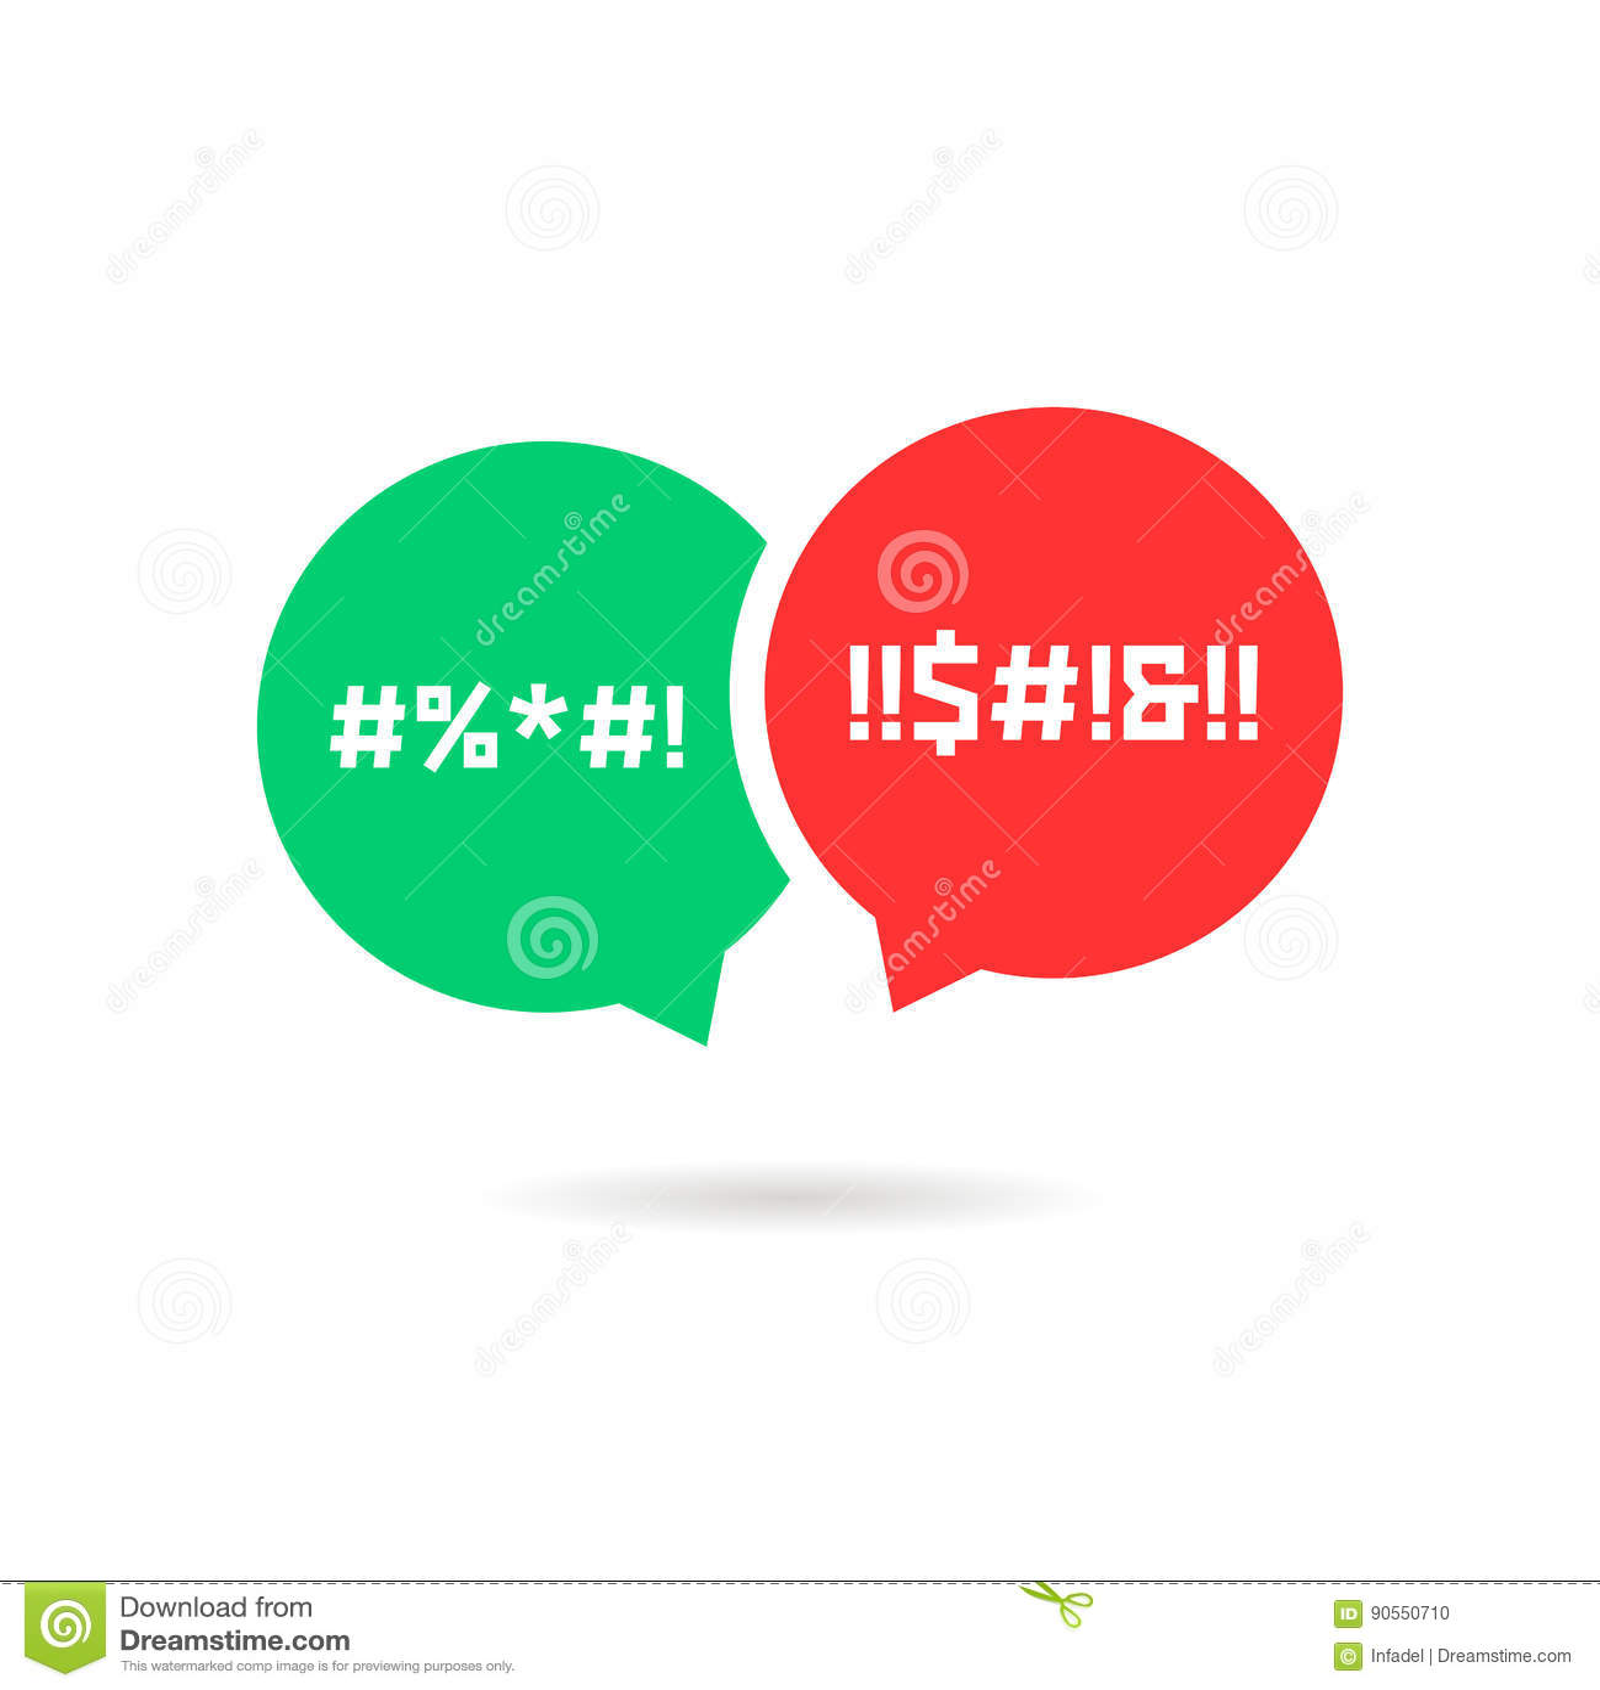 quarrel with speech bubbles stock vector image 90550710 No Parental Advisory Template Tumblr Transparent Parental Advisory